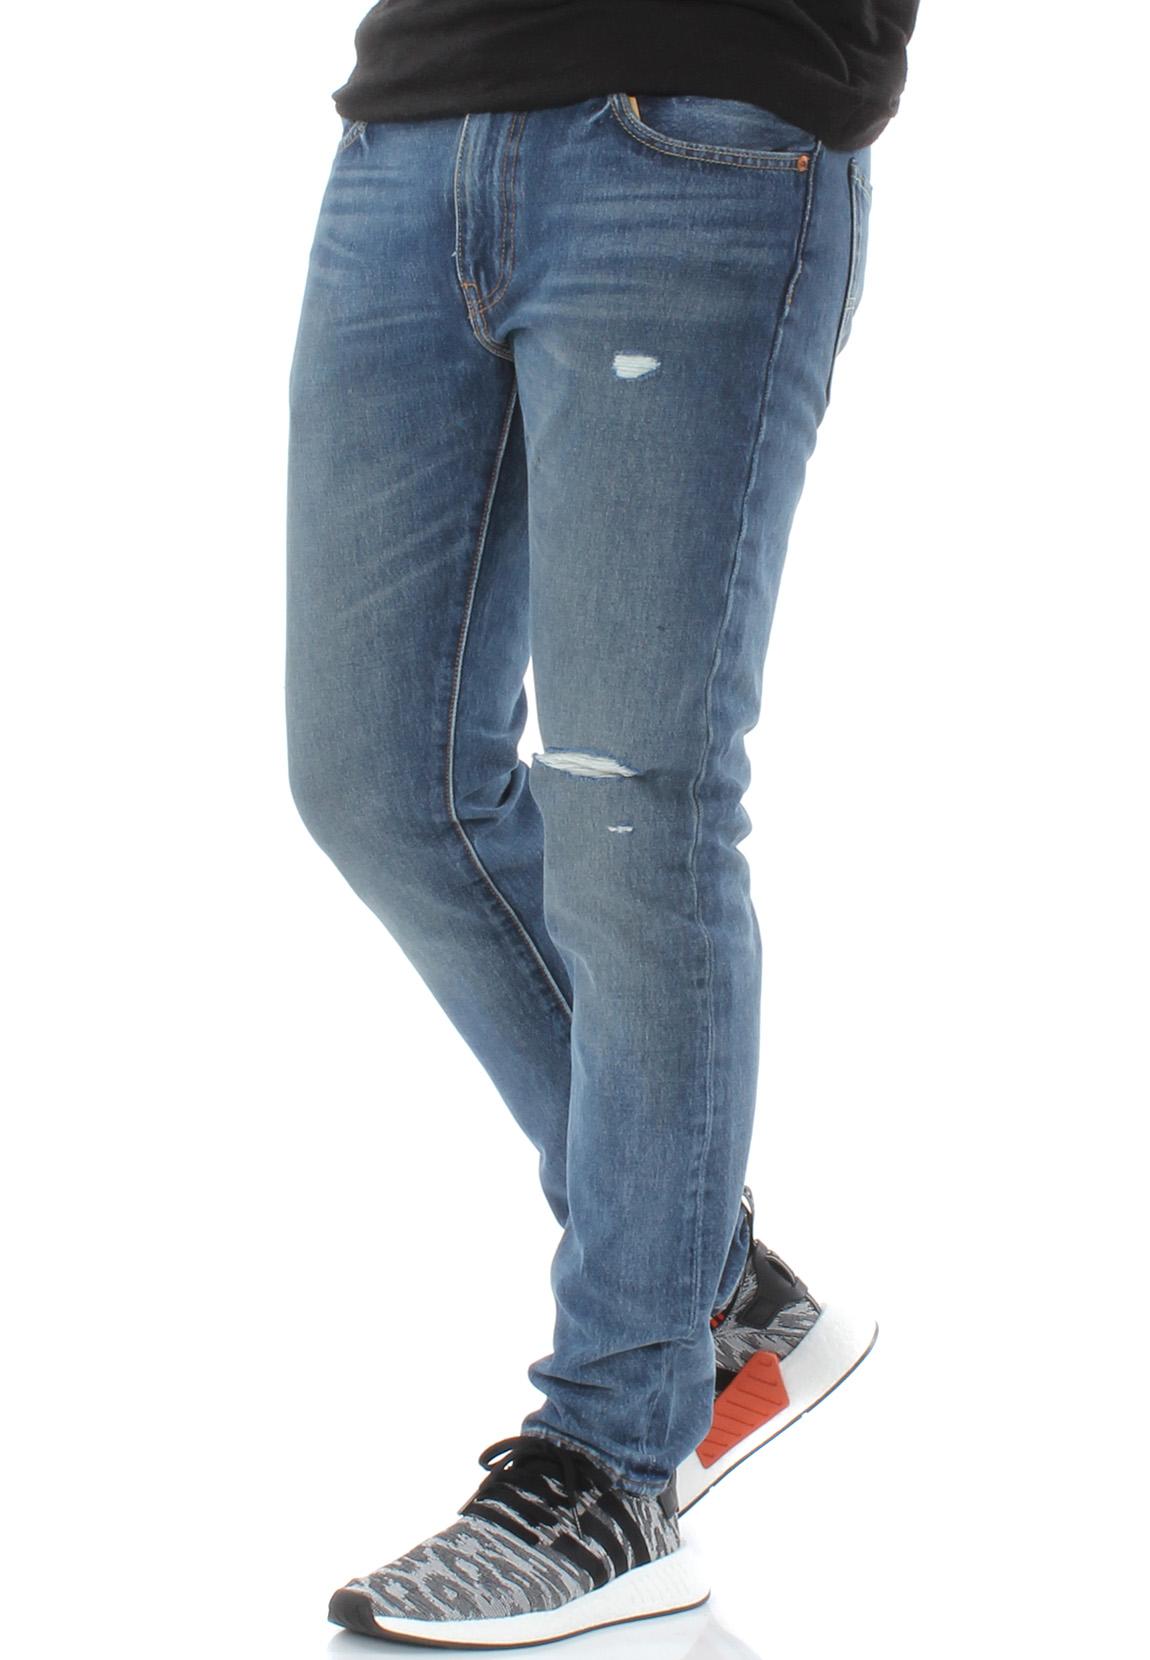 levis herren jeans 512 slim taper fit 28833 0069 grambs dx herren jeans chinos. Black Bedroom Furniture Sets. Home Design Ideas